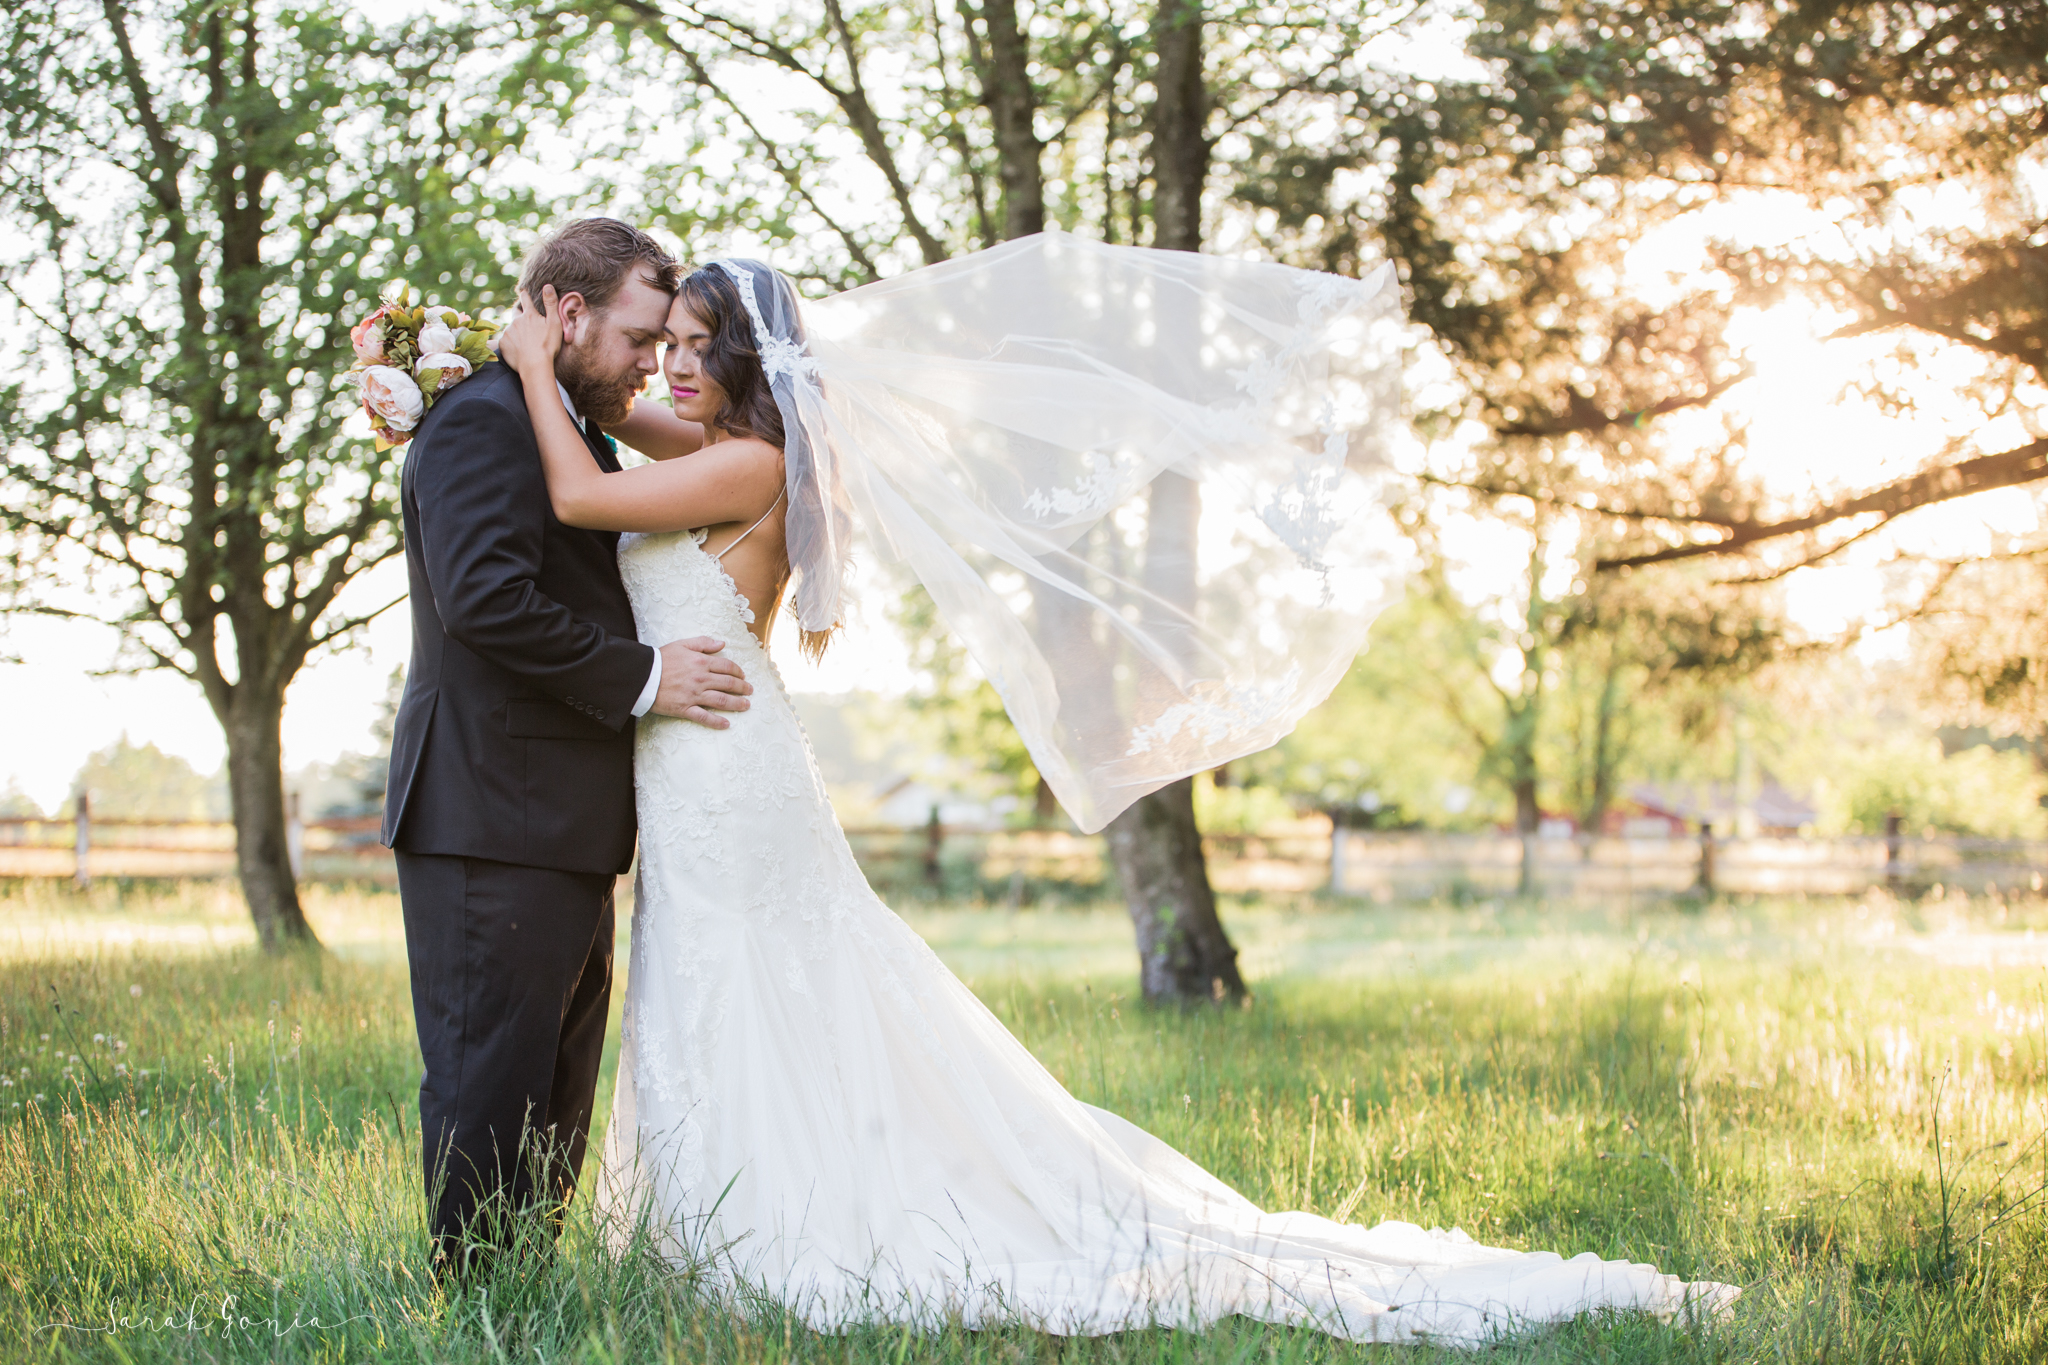 Gorgeous wedding dress by New Beginnings Bridal Studio